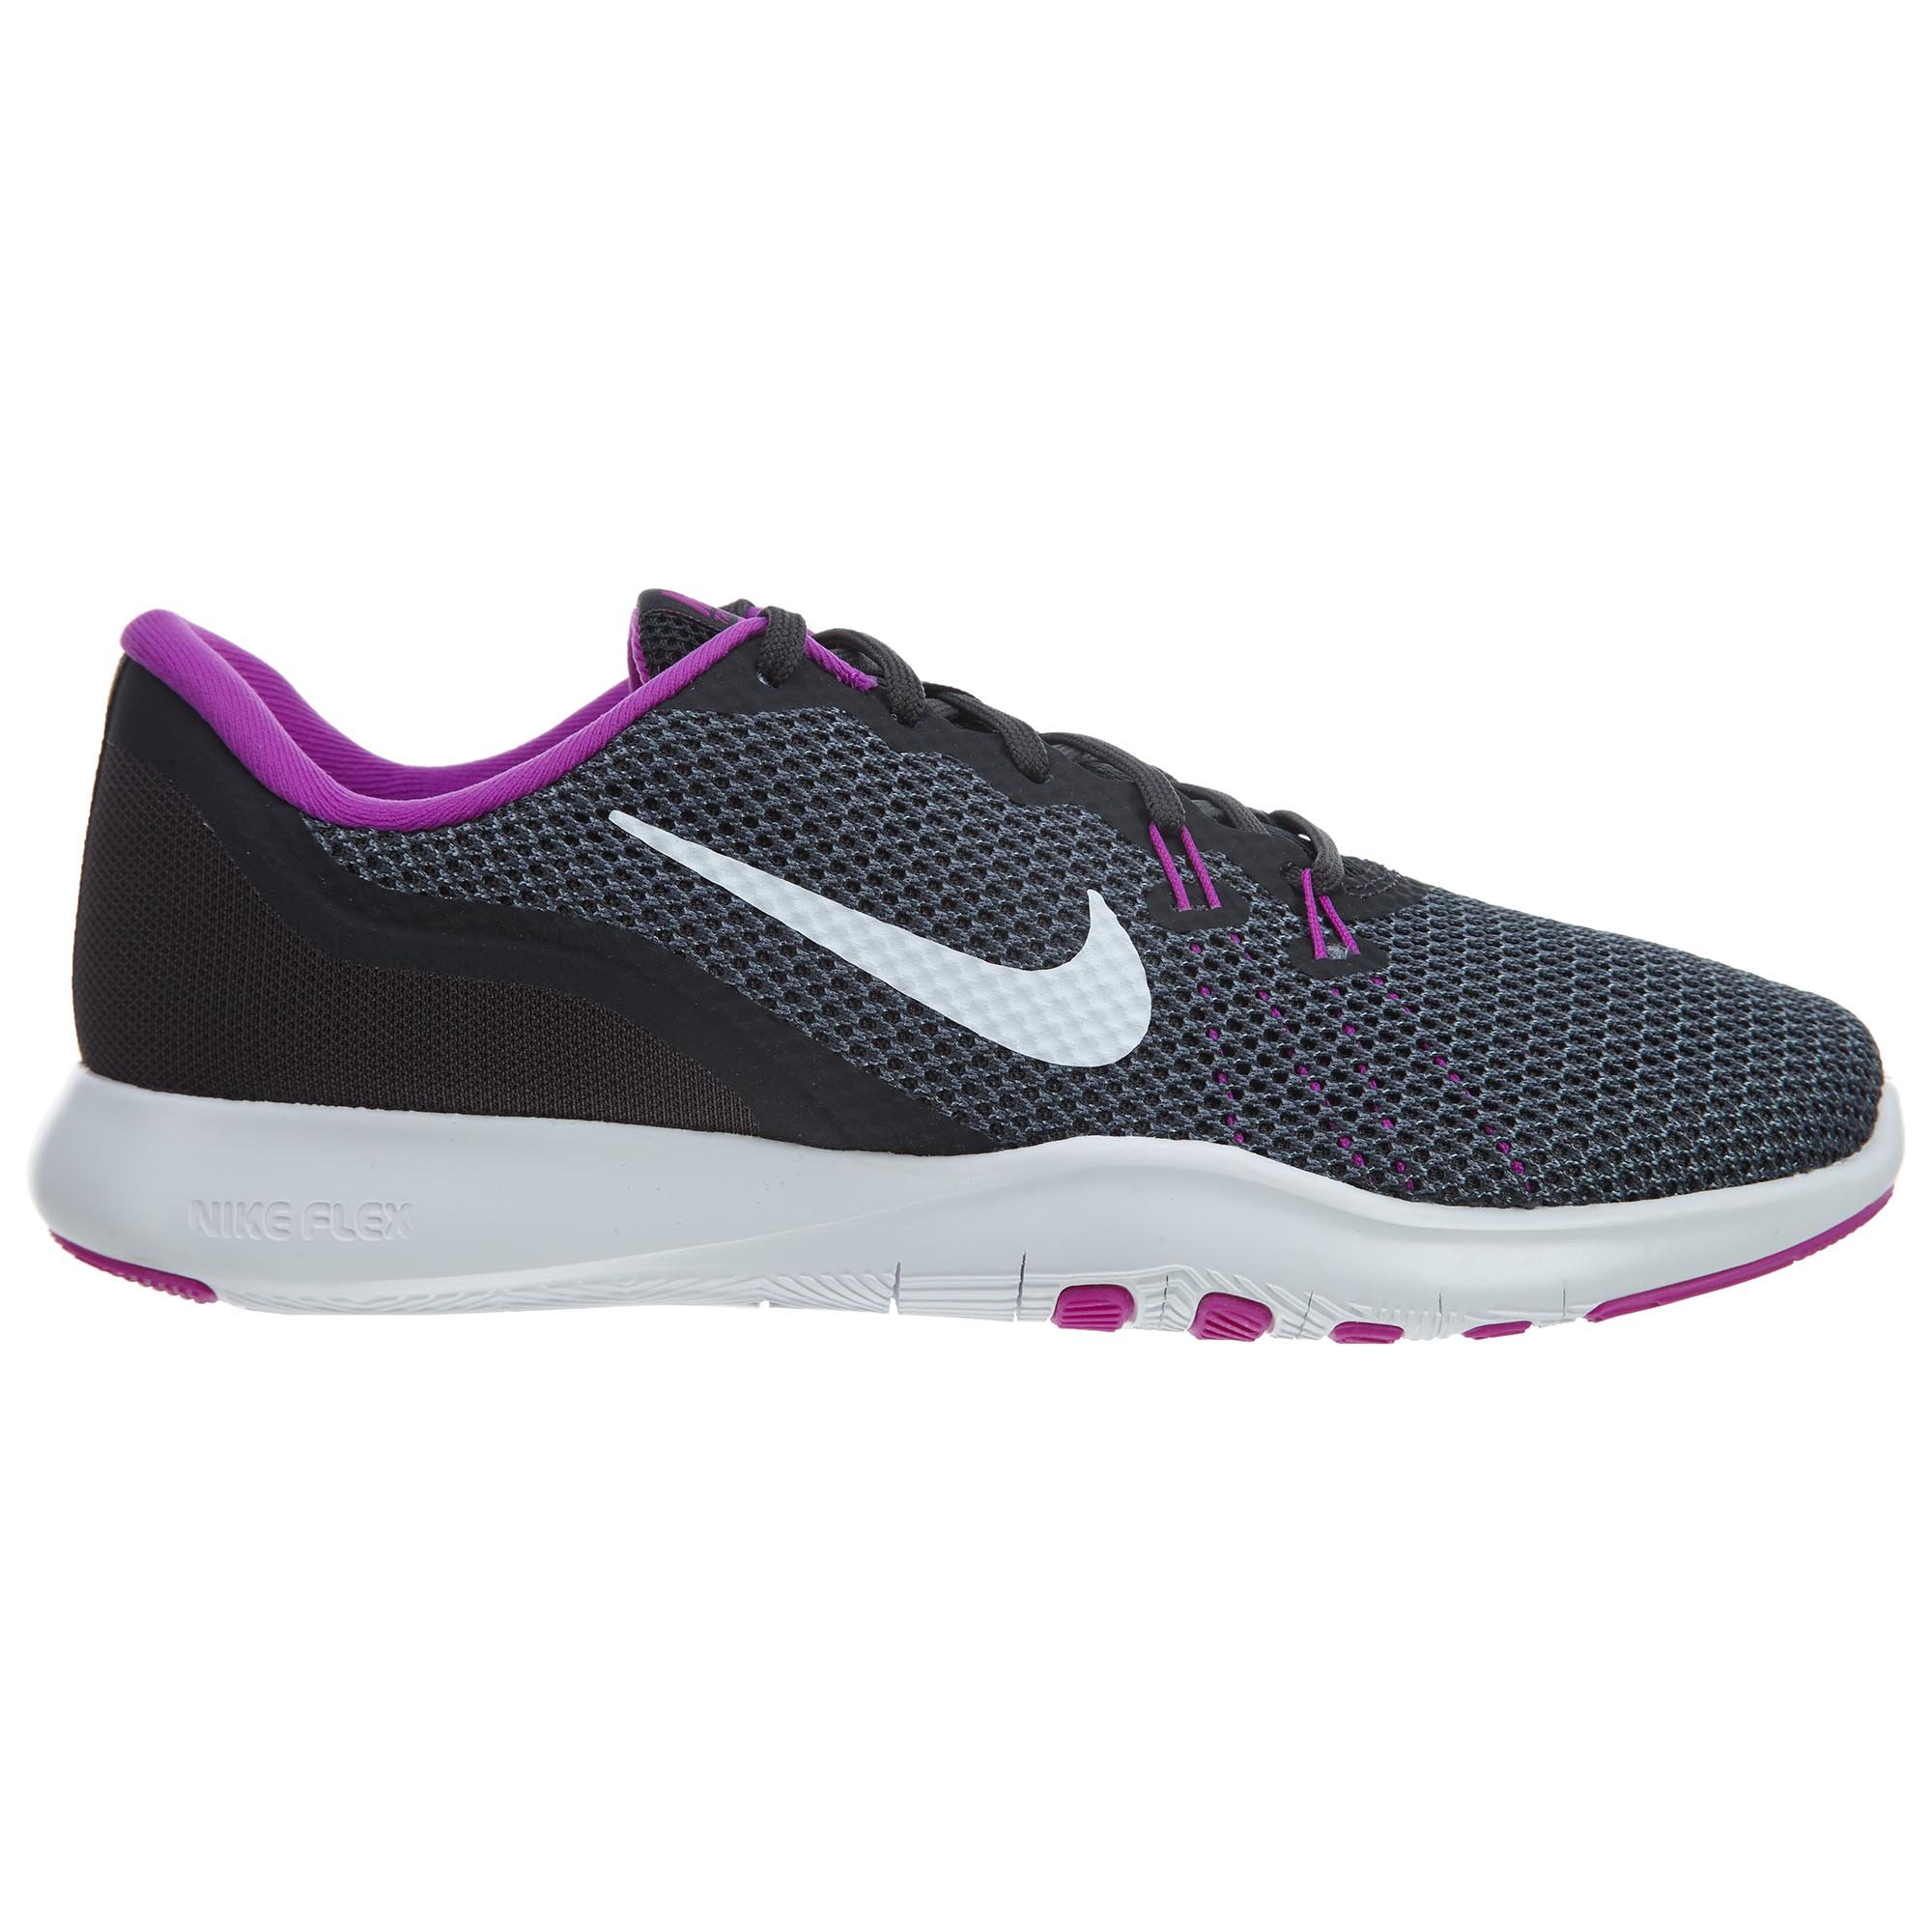 Nike Womens Flex Trainer 7 Anthracite/White/Dark/Grey Training Shoe 6.5 Women US